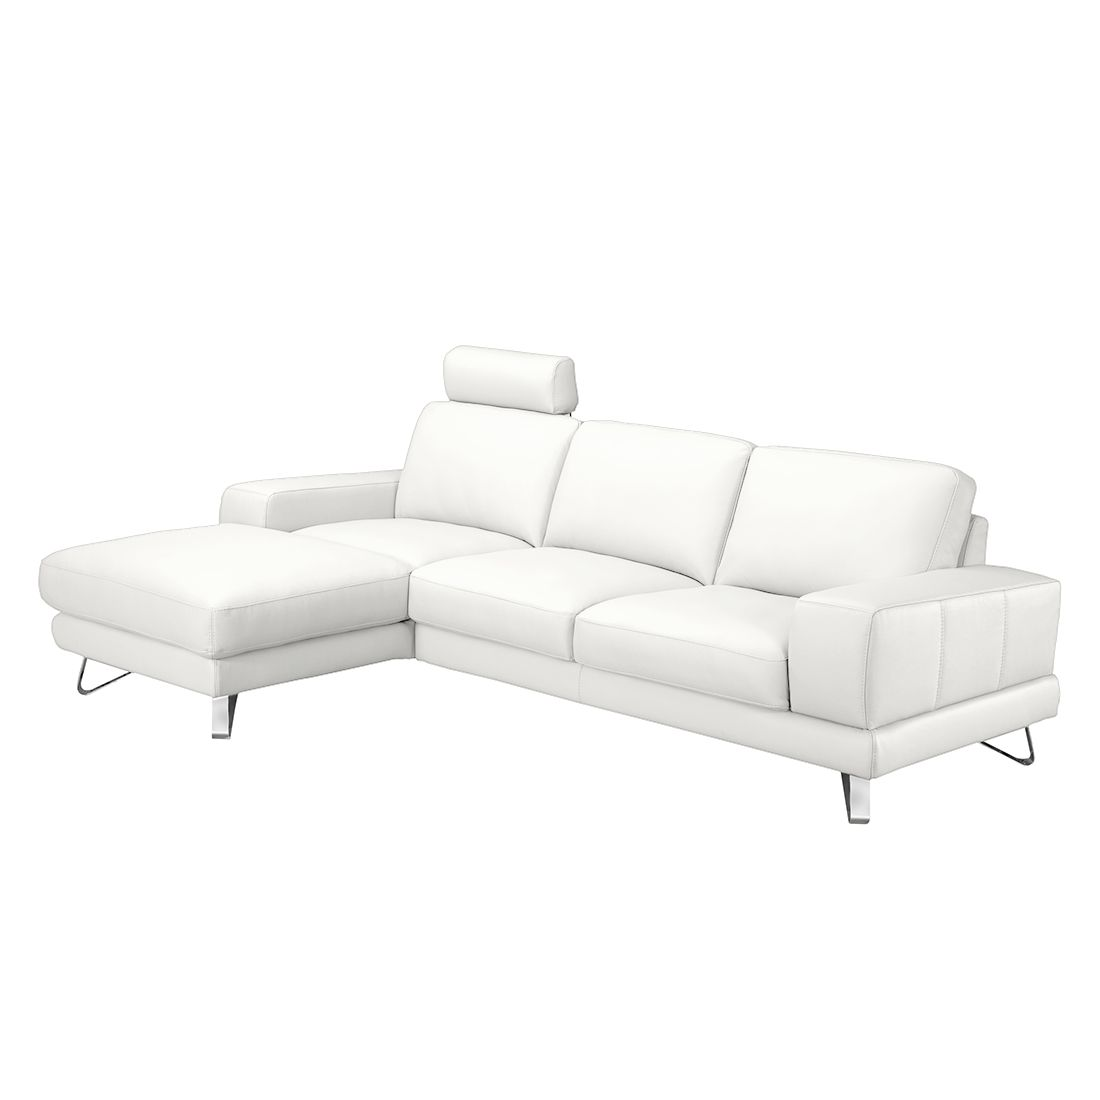 ecksofas online kaufen. Black Bedroom Furniture Sets. Home Design Ideas